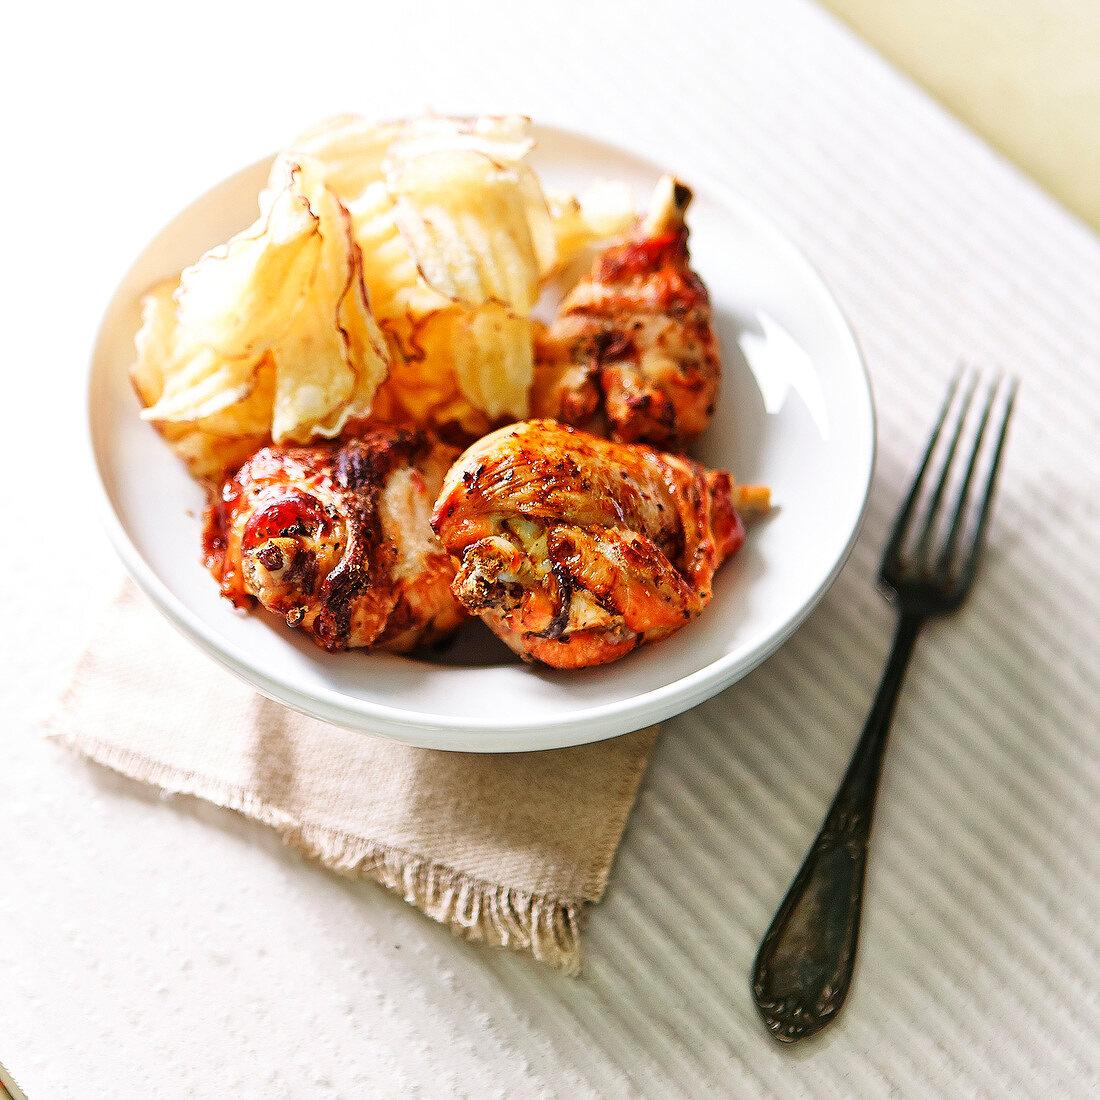 Curried chicken drumsticks and potato crisps